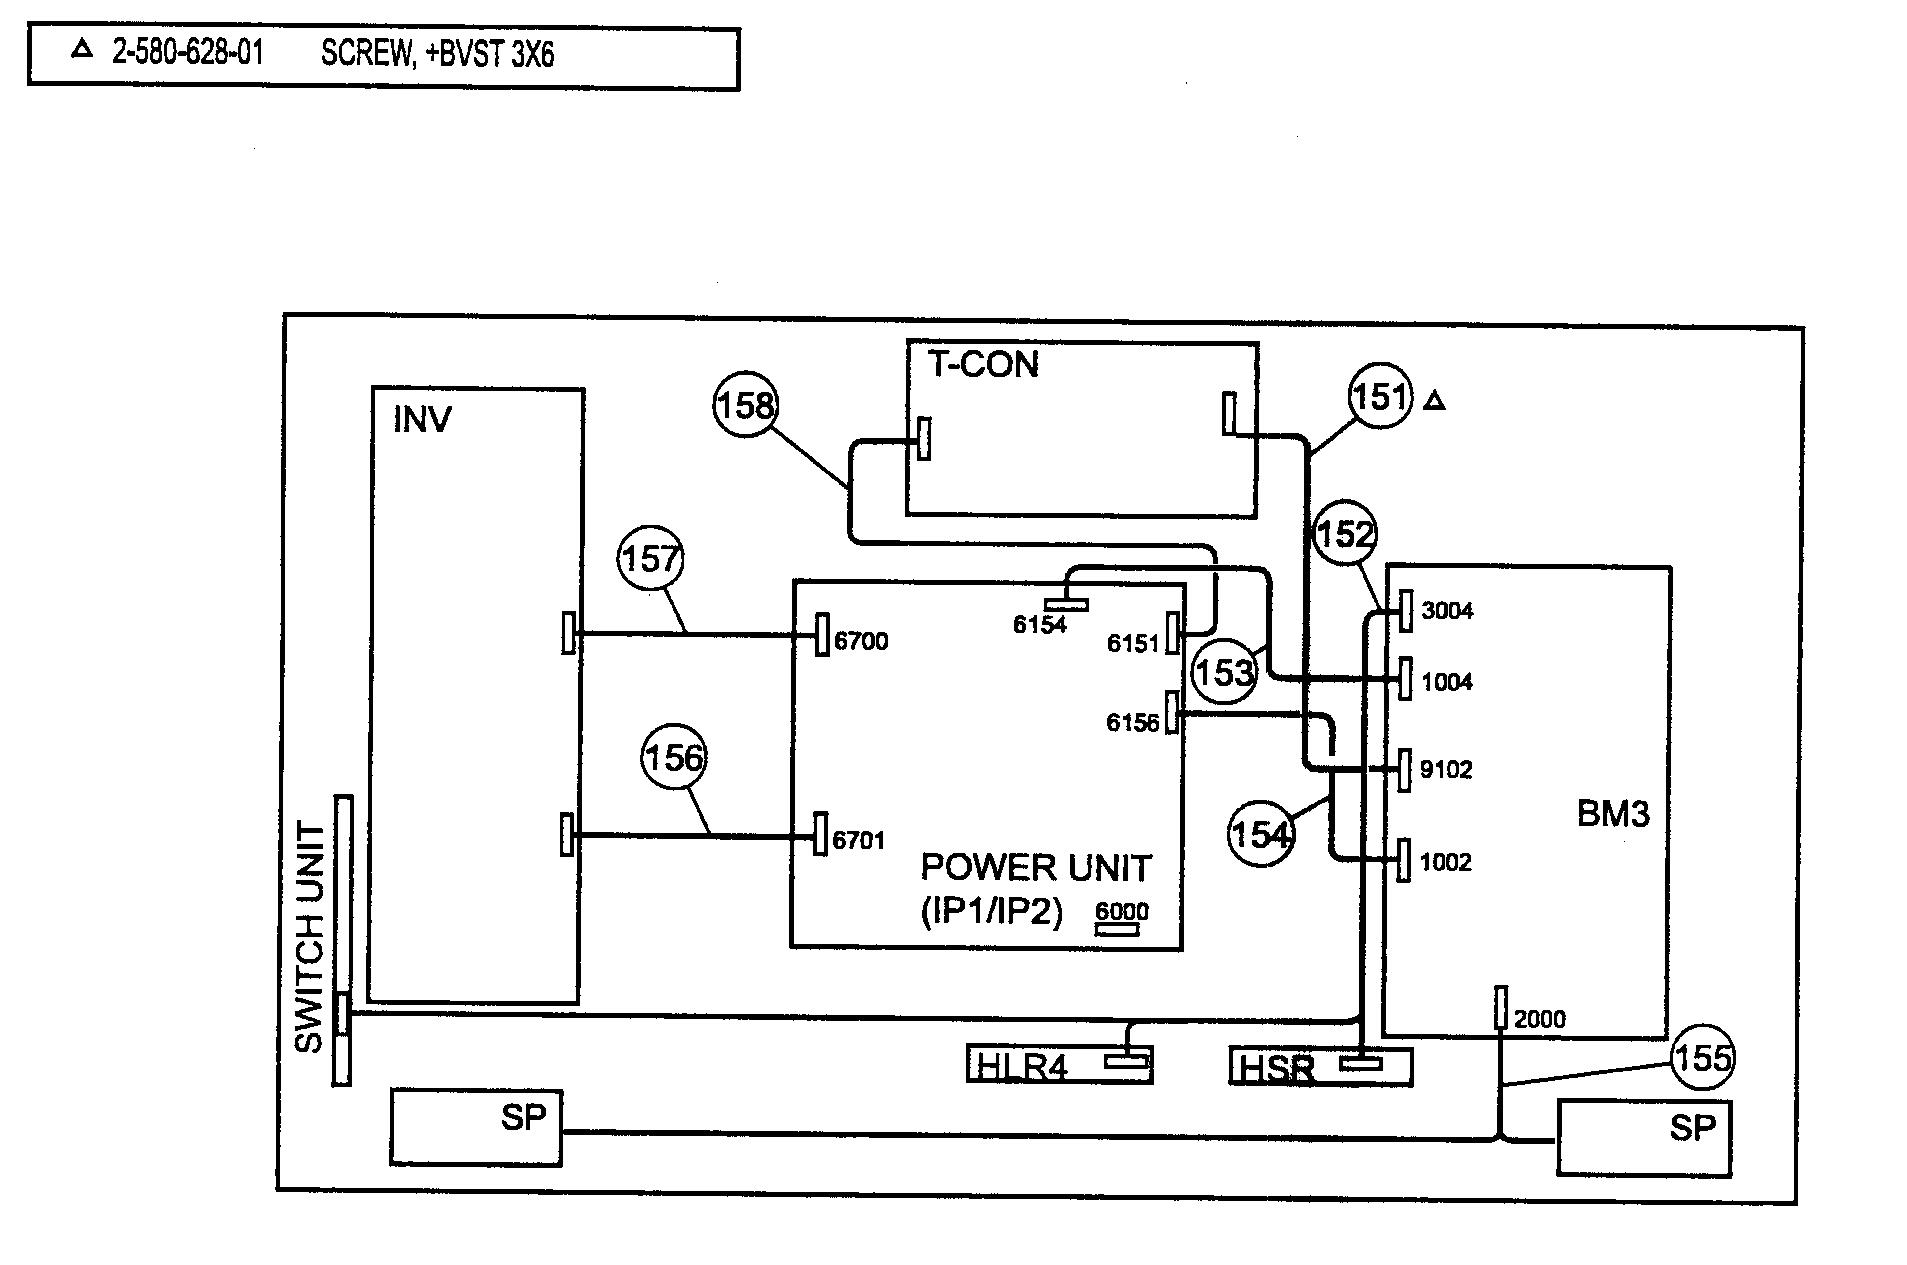 Sony model KDL-46V5100 lcd television genuine parts